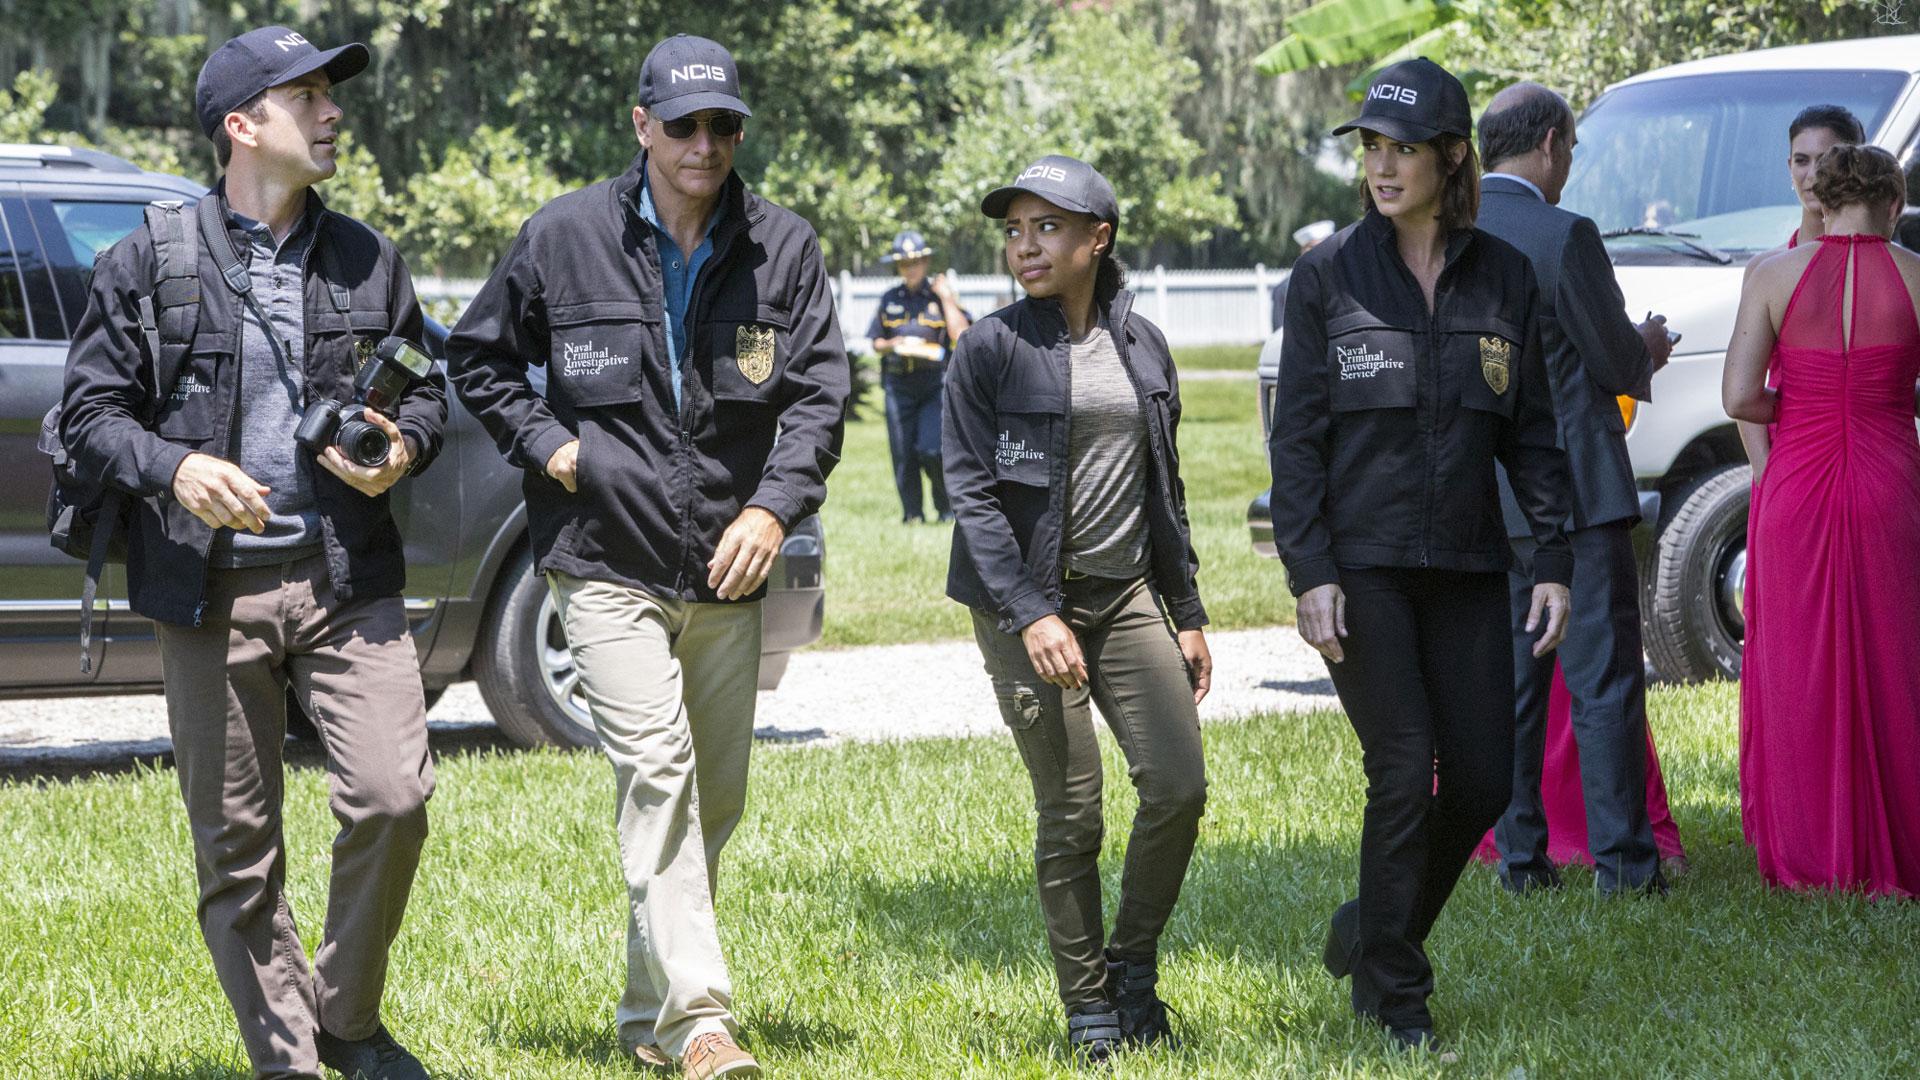 Lucas Black as Christopher LaSalle, Scott Bakula as Dwayne Pride, Sonja Percy as Shalita Grant, and Zoe McLellan as Meredith Brody